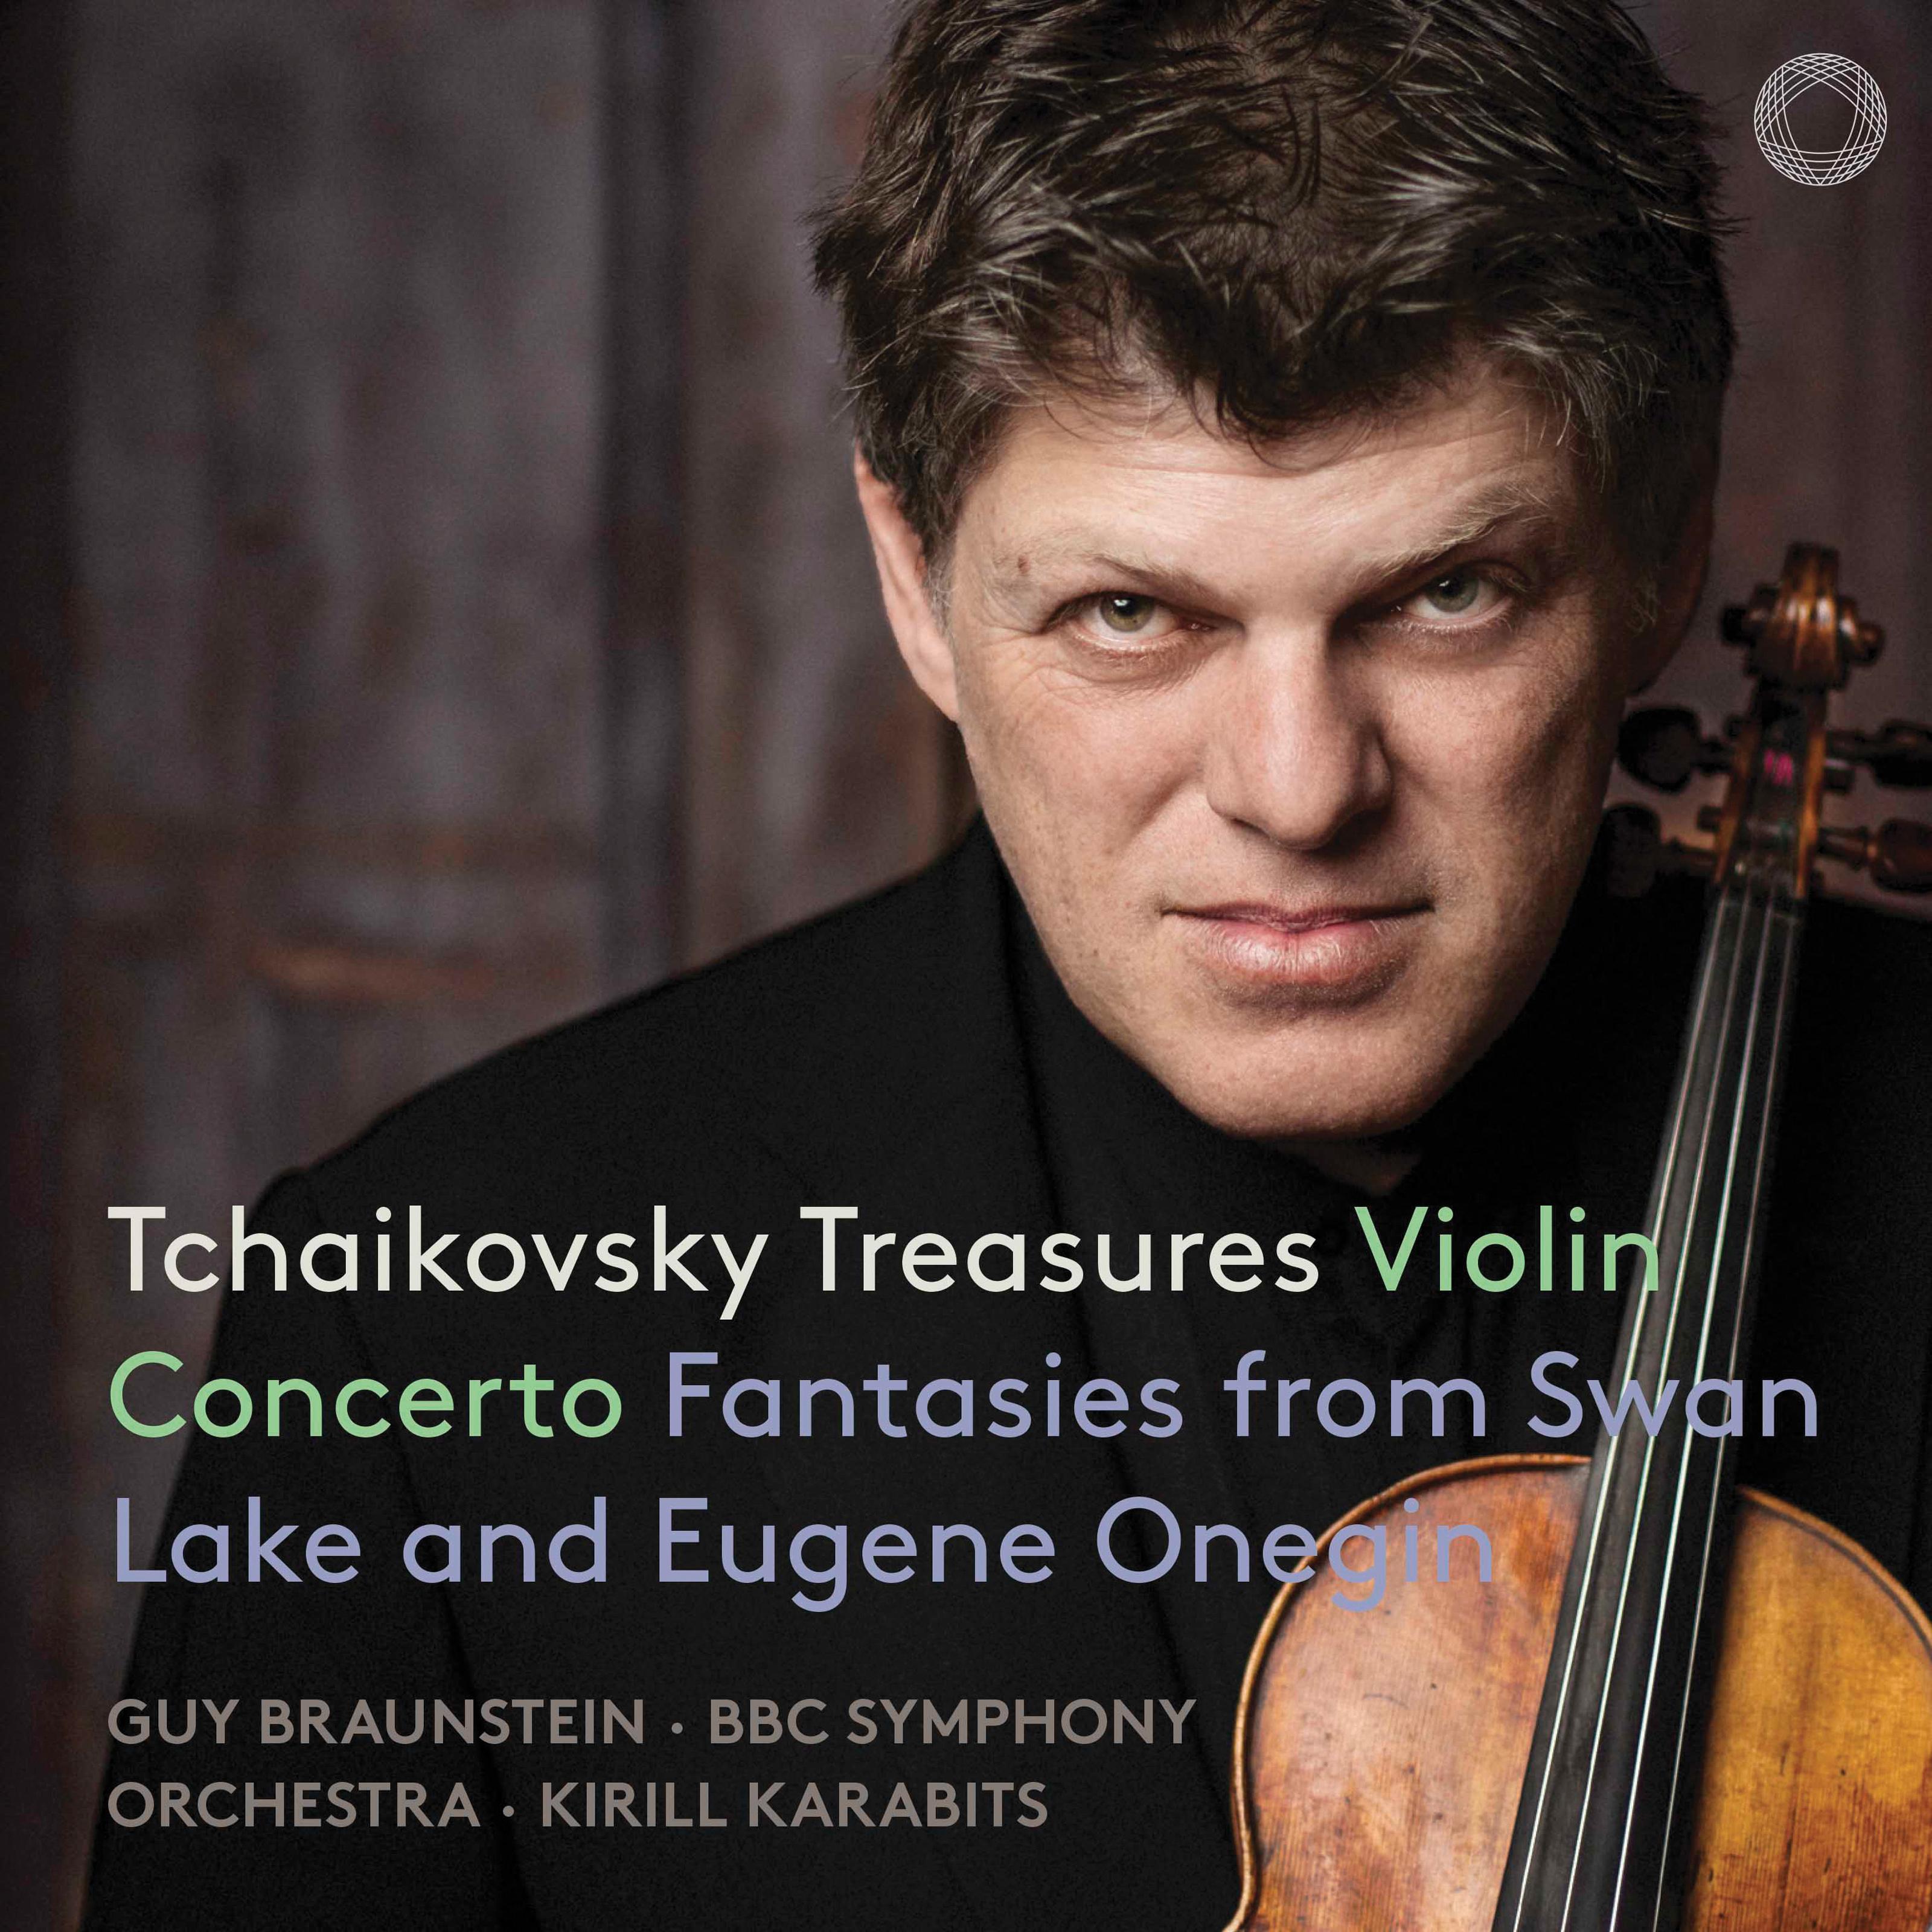 Tchaikovsky Treasures Classical Orchestral & Concertos PentaTone